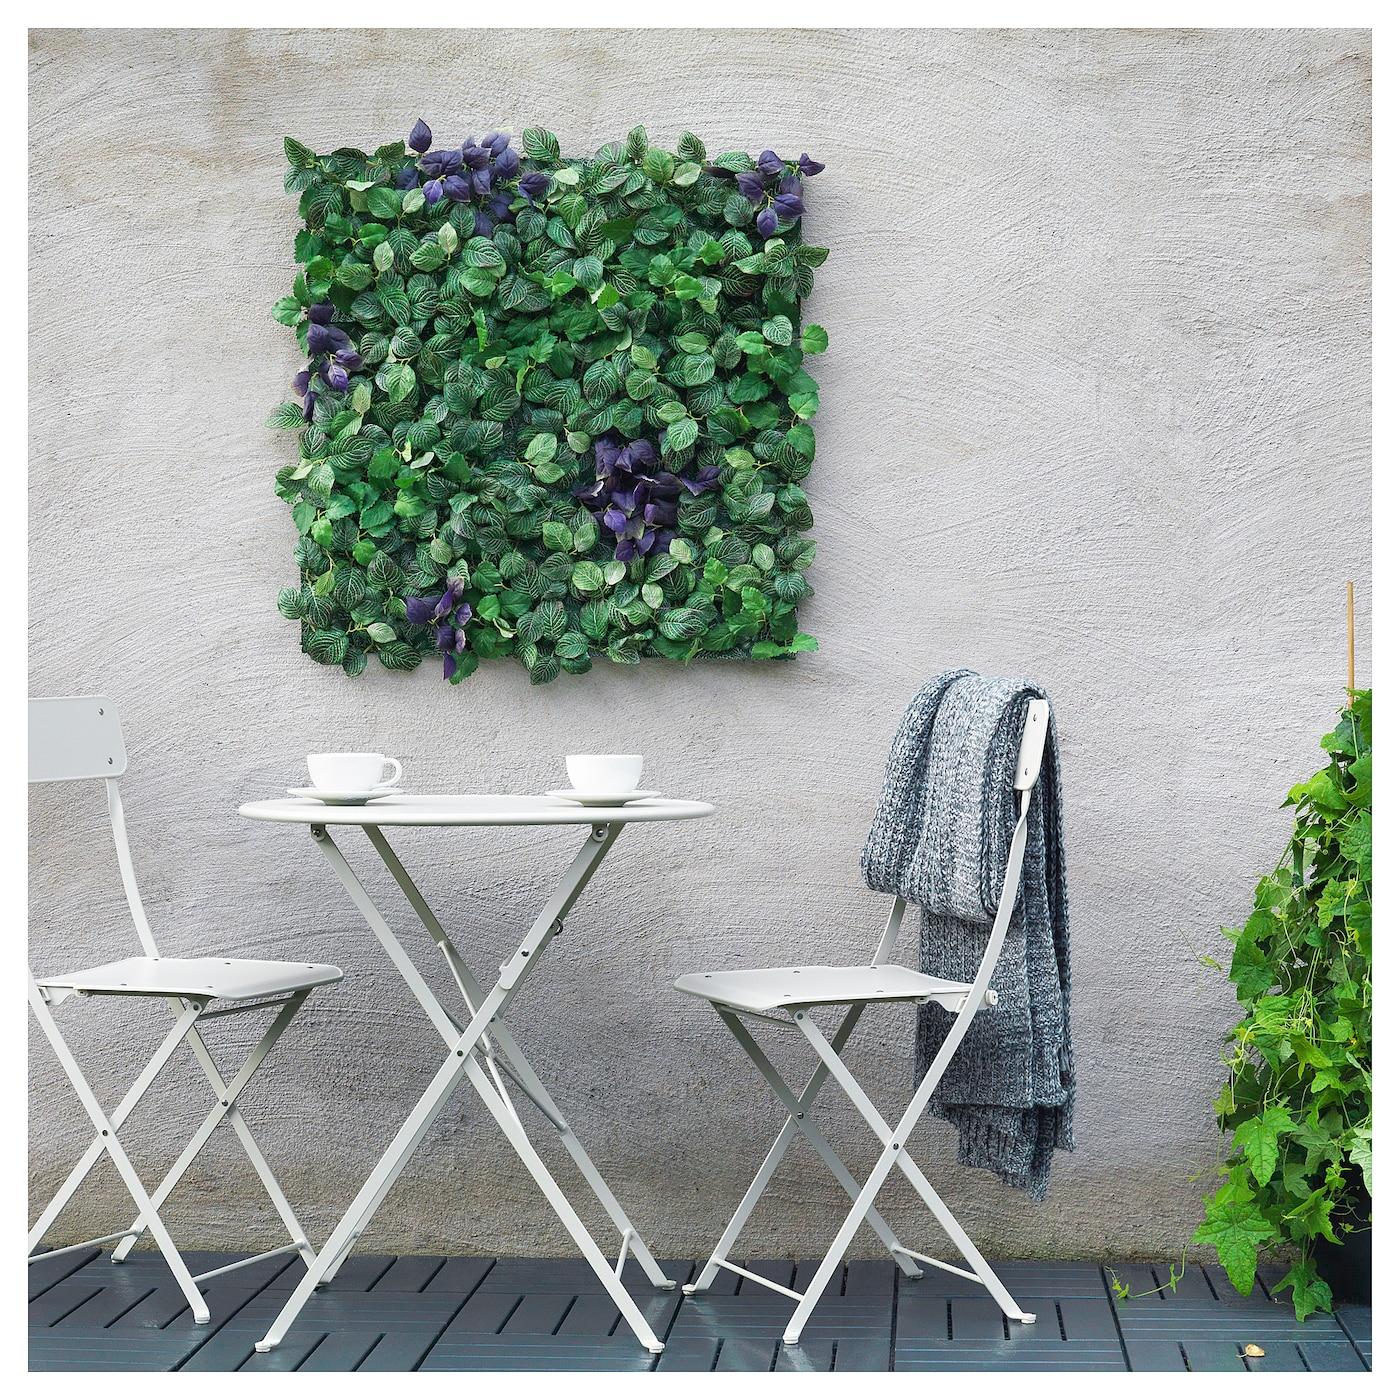 Fejka Planta Artificial De Montaje En Pared Int Ext Verde Violeta 26